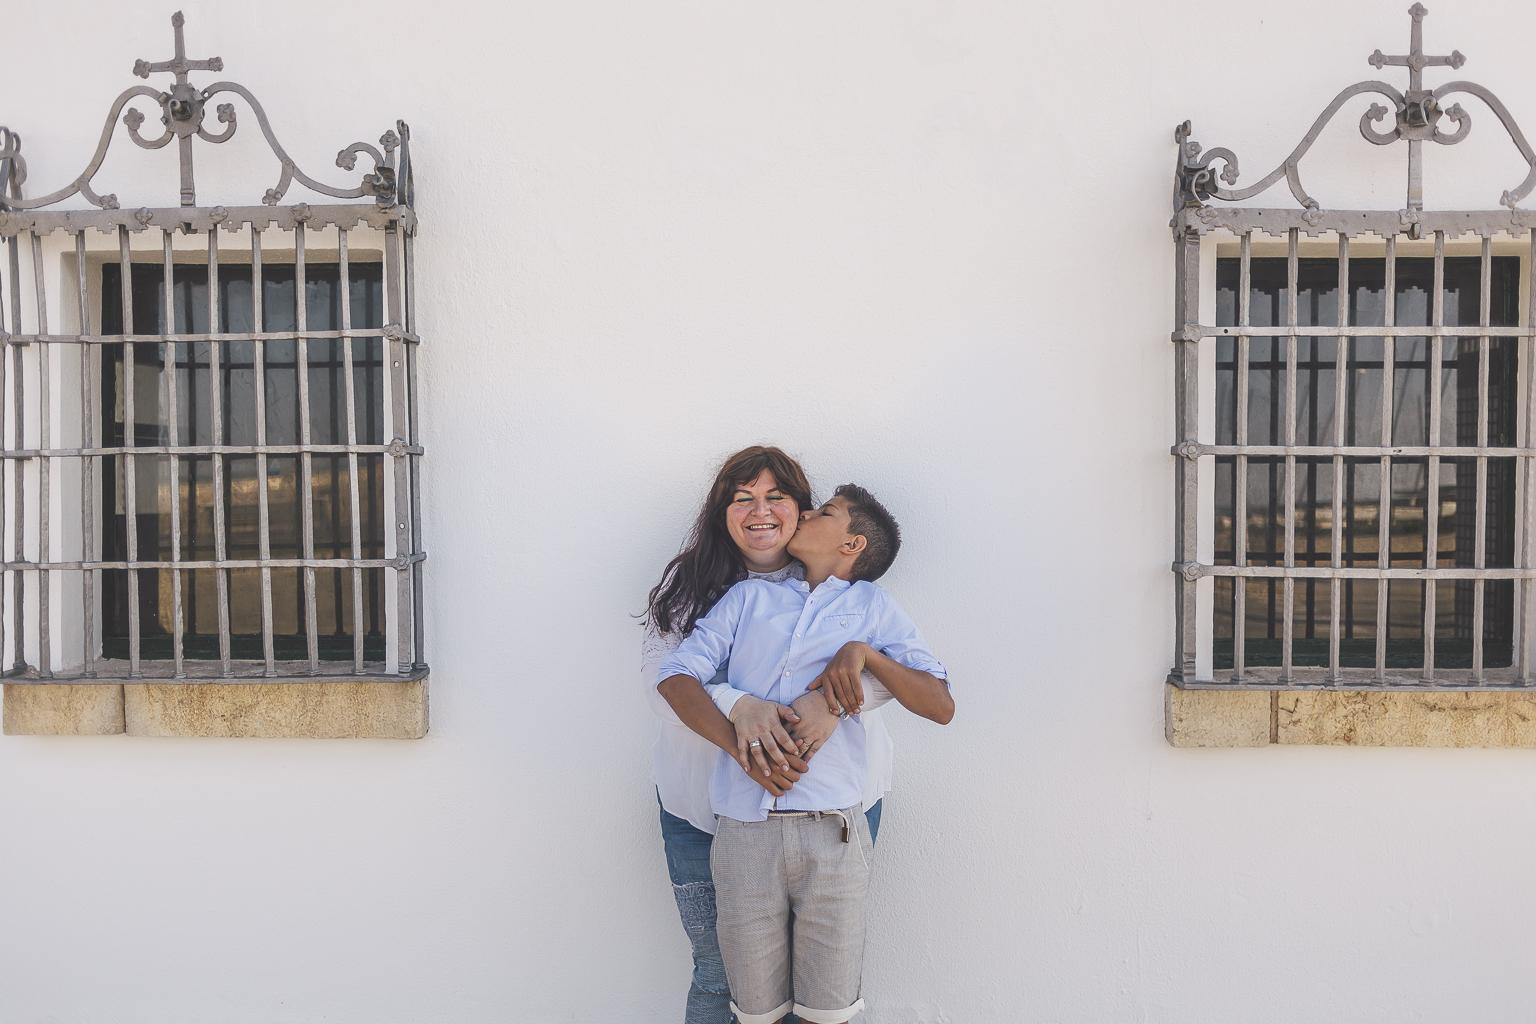 fotógrafo primera comunión sitges :: primera comunión :: fotografía de primera comunión :: fotógrafo barcelona :: fotógrafo siitges